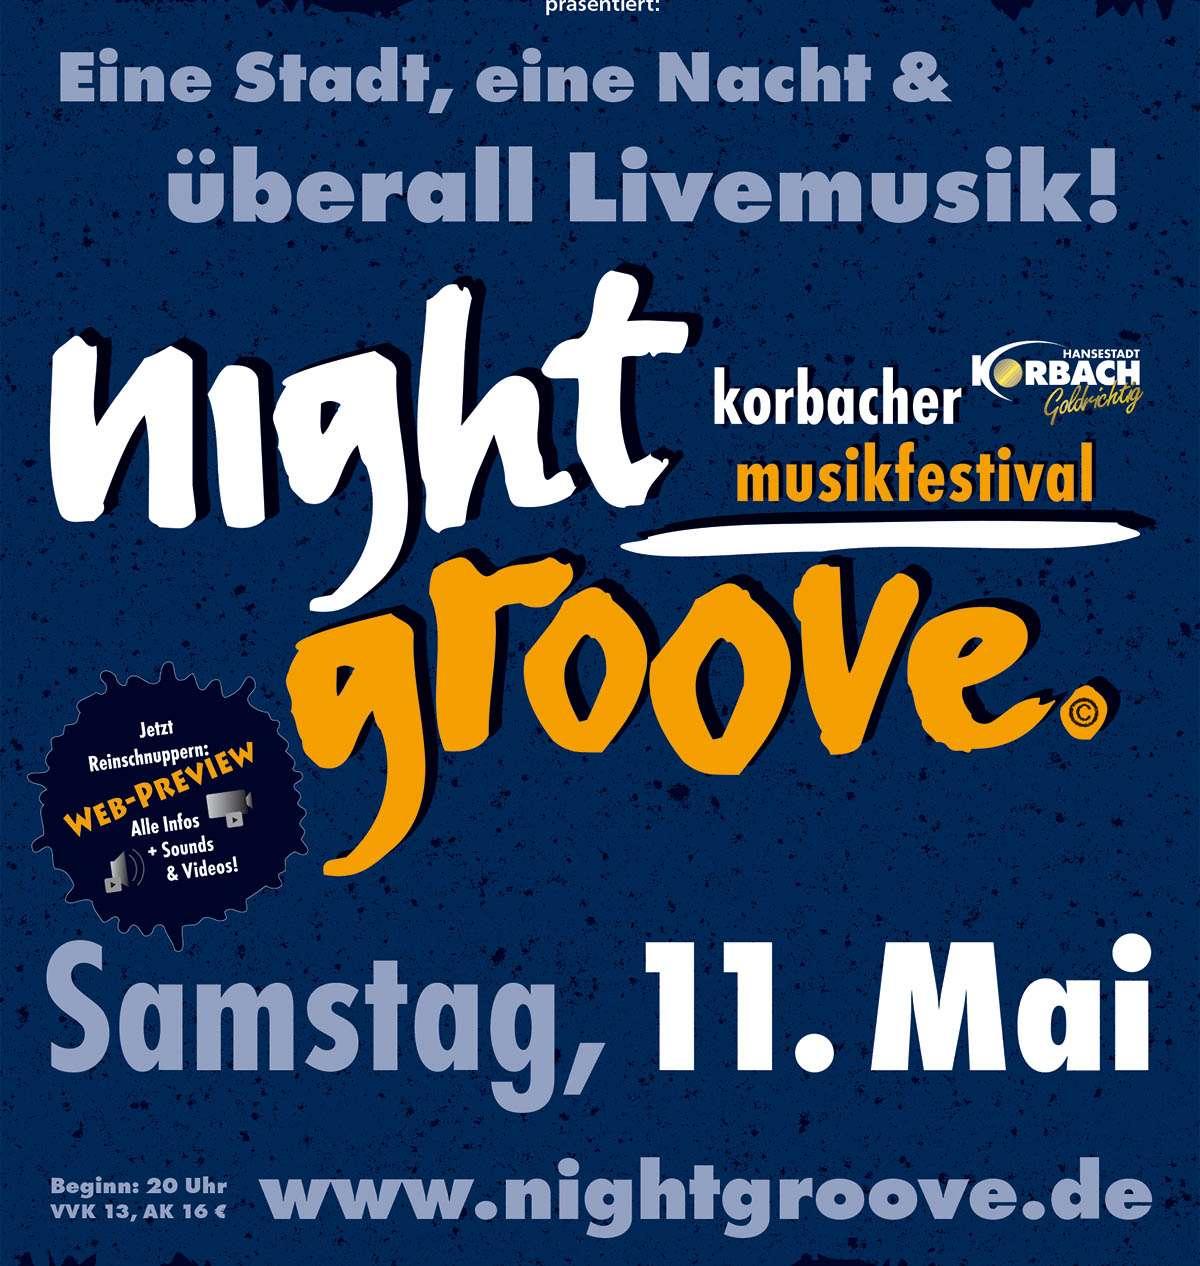 Ww-Terminator: Nightgroove - The Herbpirates und Sonic Six - Zur Krone Korbach - Korbach